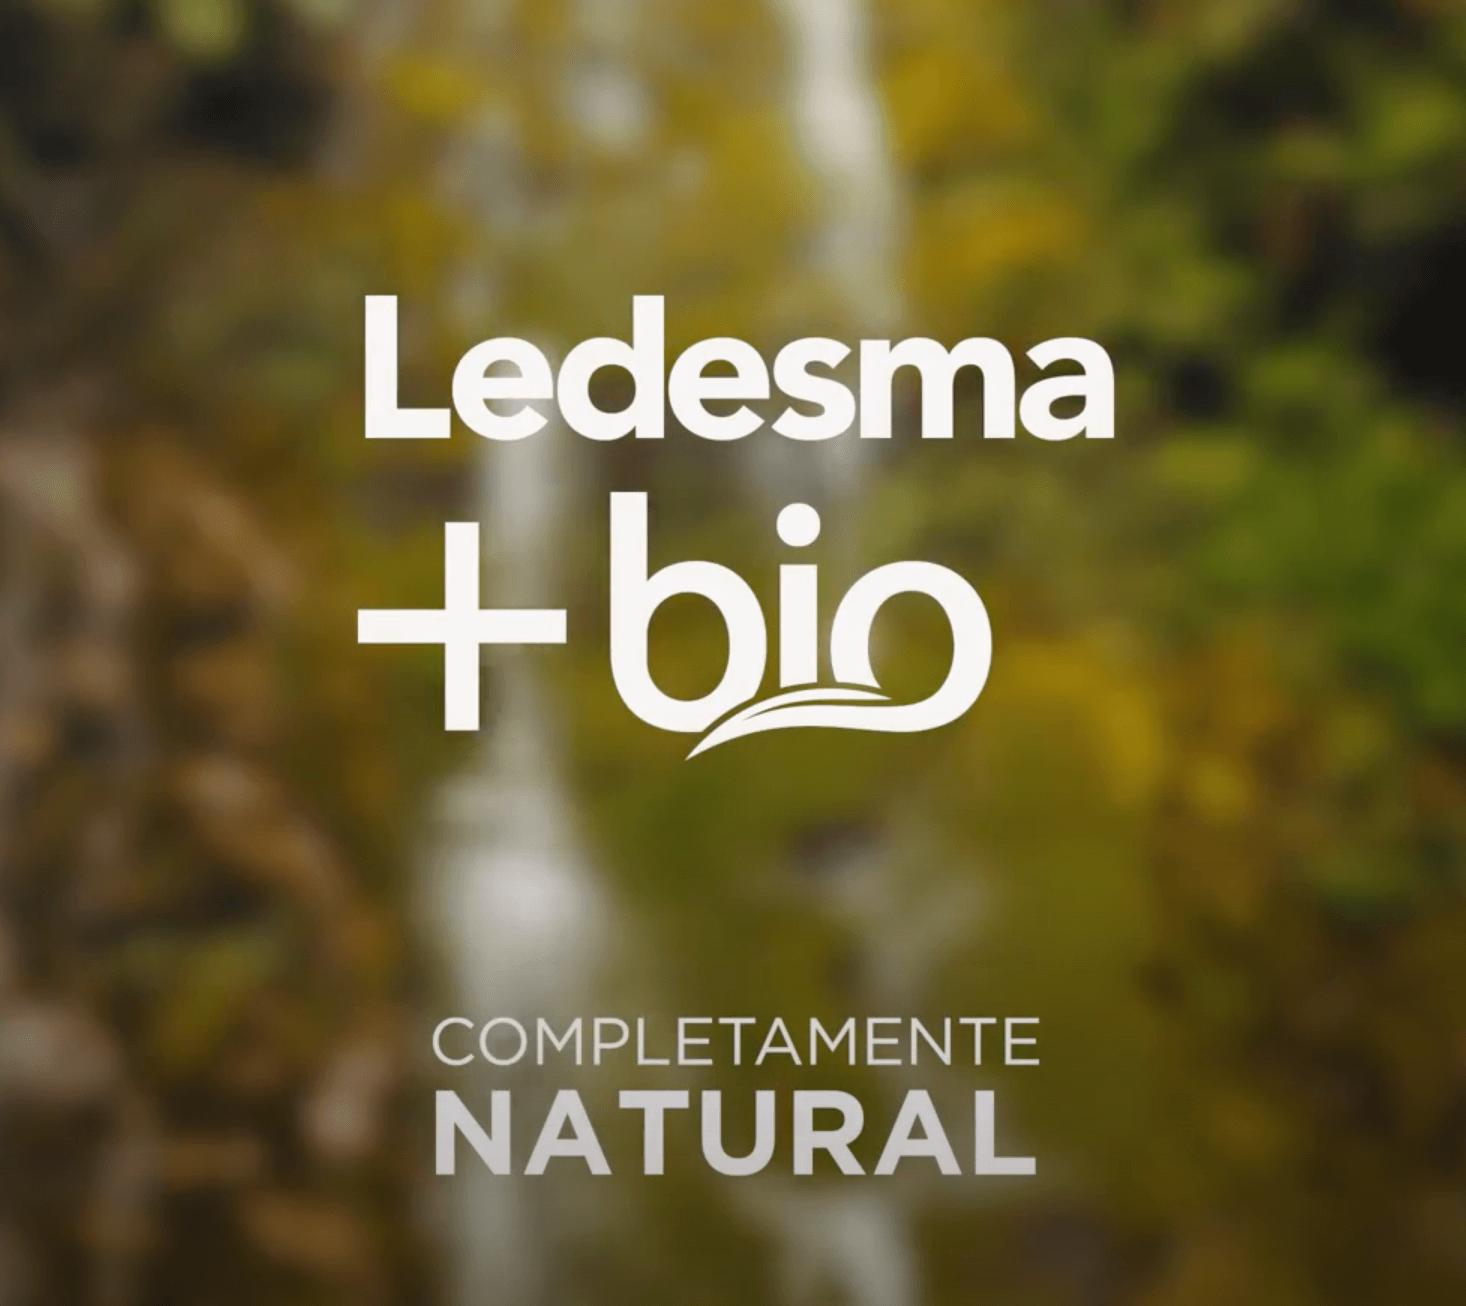 Ledesma+bio+Completamente+Natural